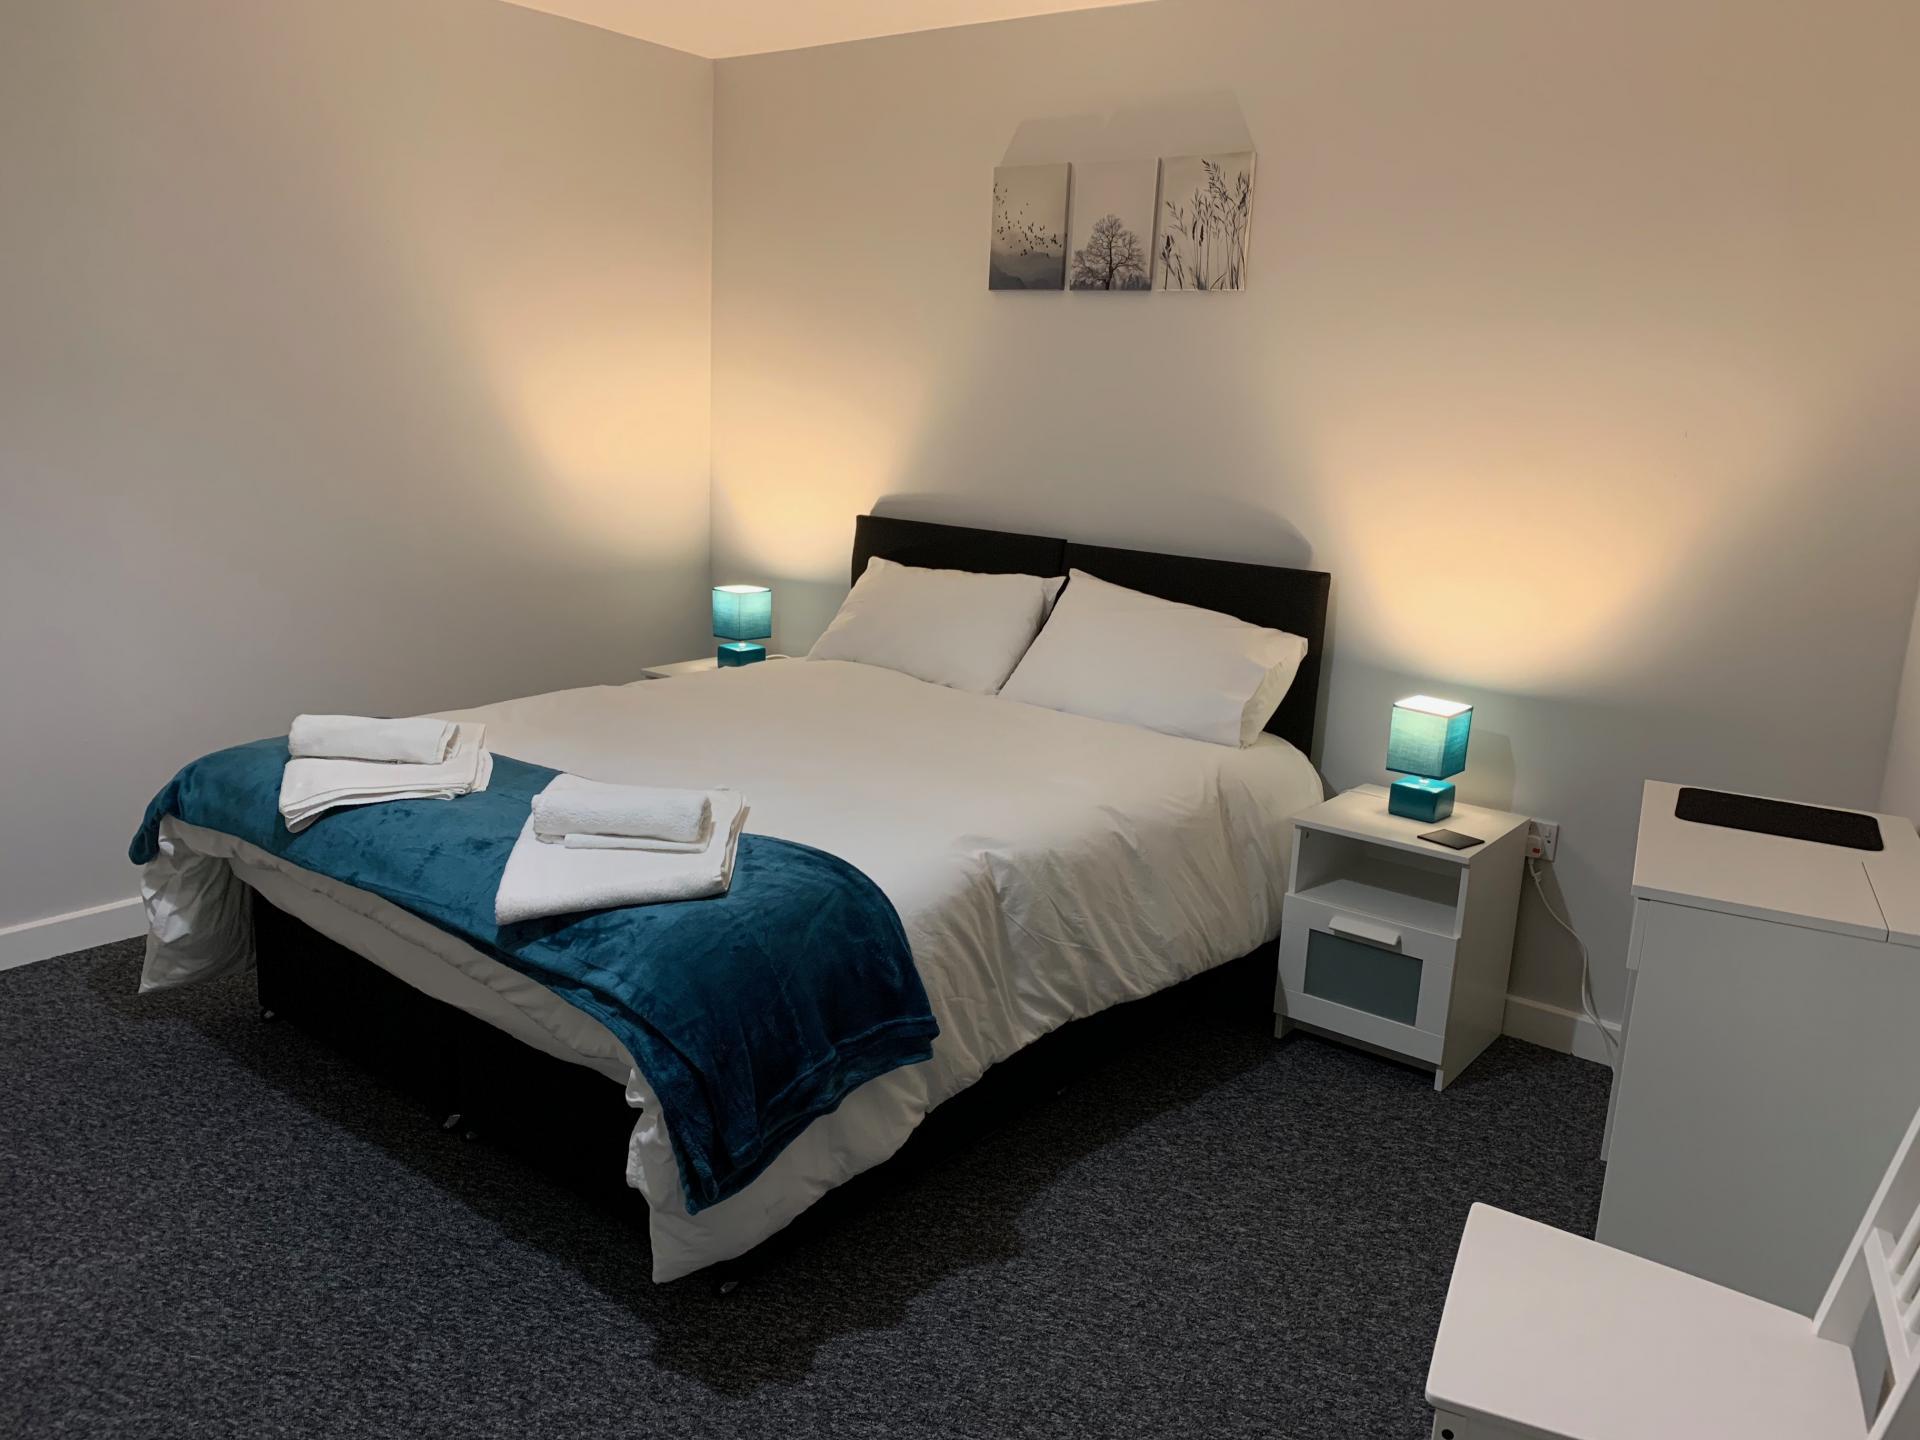 Bedroom at Kelham Island Apartment, Neepsend, Sheffield